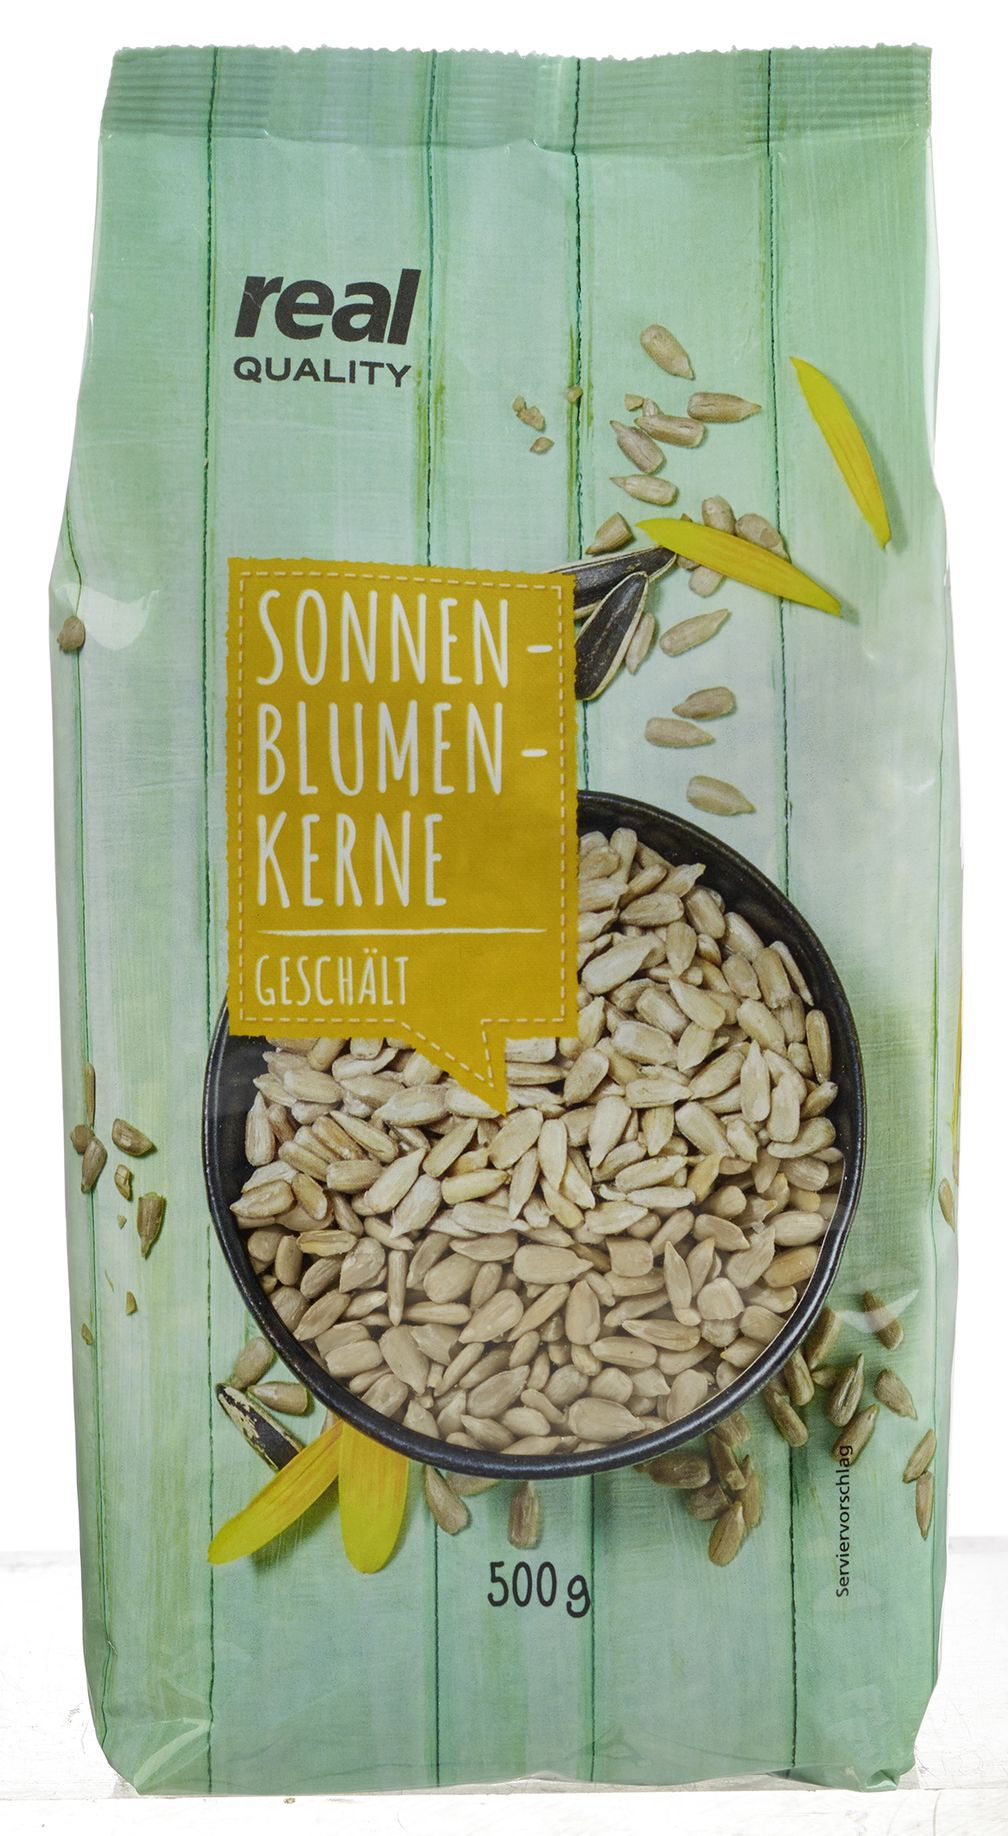 "real QUALITY Sonnenblumenkerne 500g. Bild: ""obs/real GmbH"""